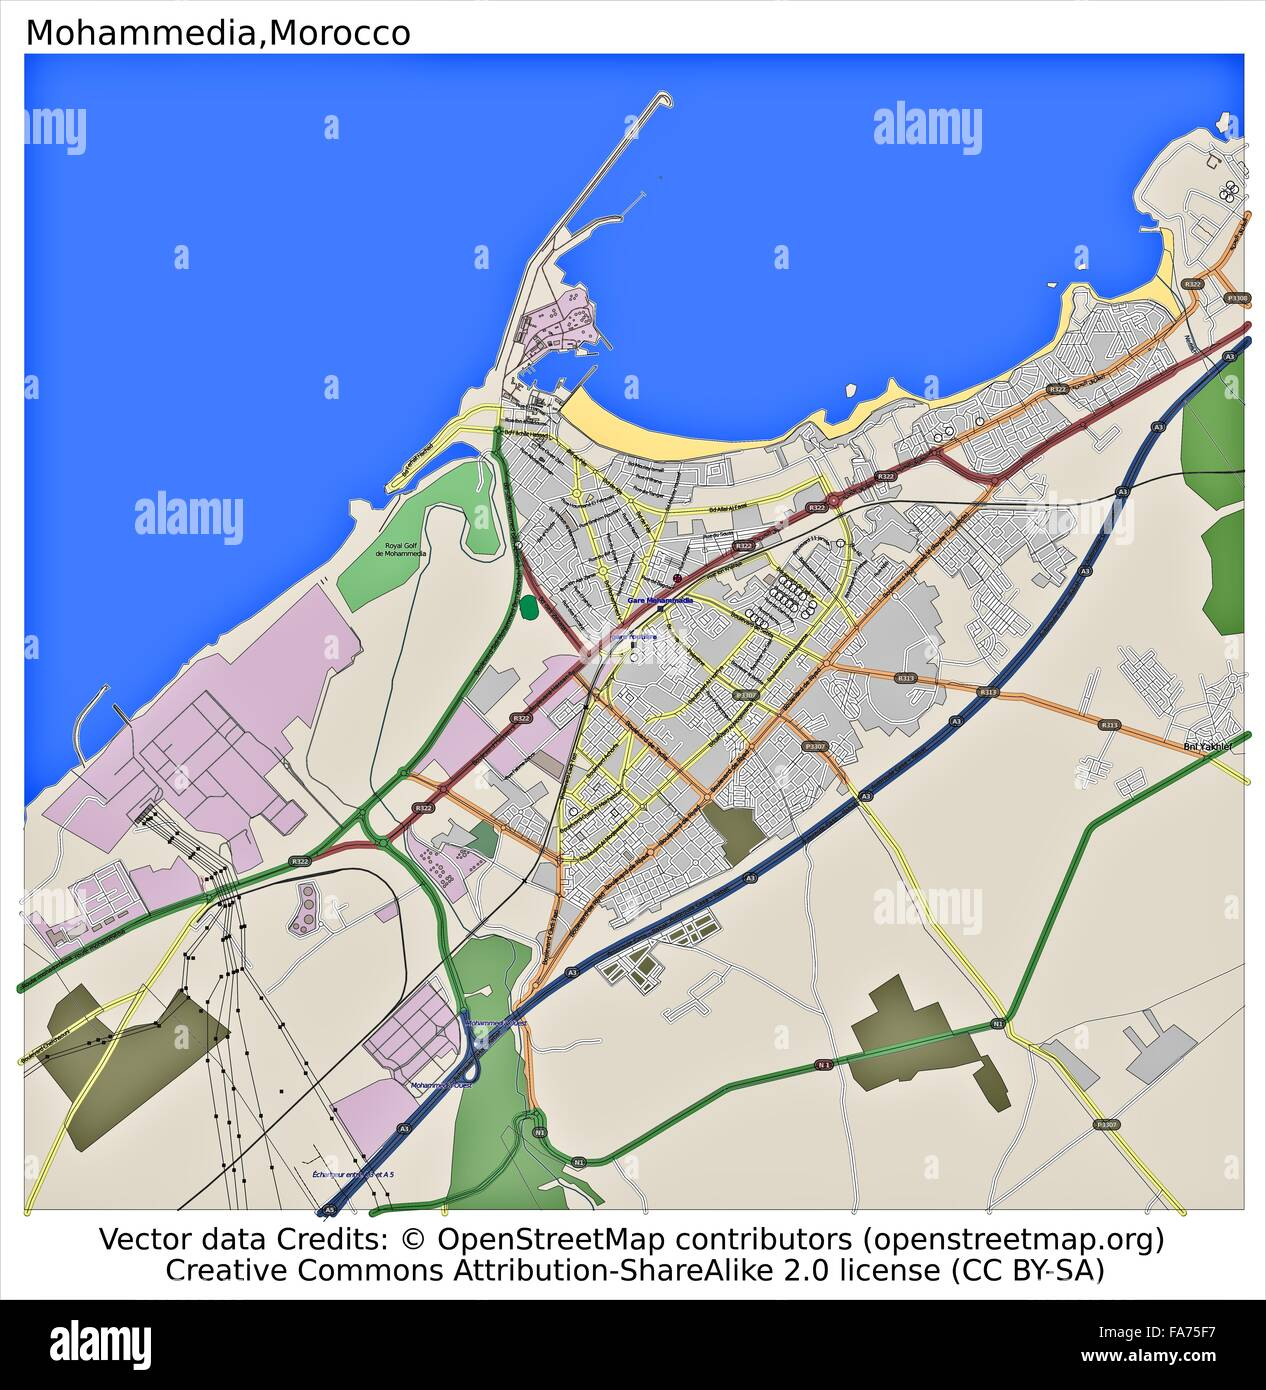 Mohammedia Morocco location map Stock Photo 92356411 Alamy